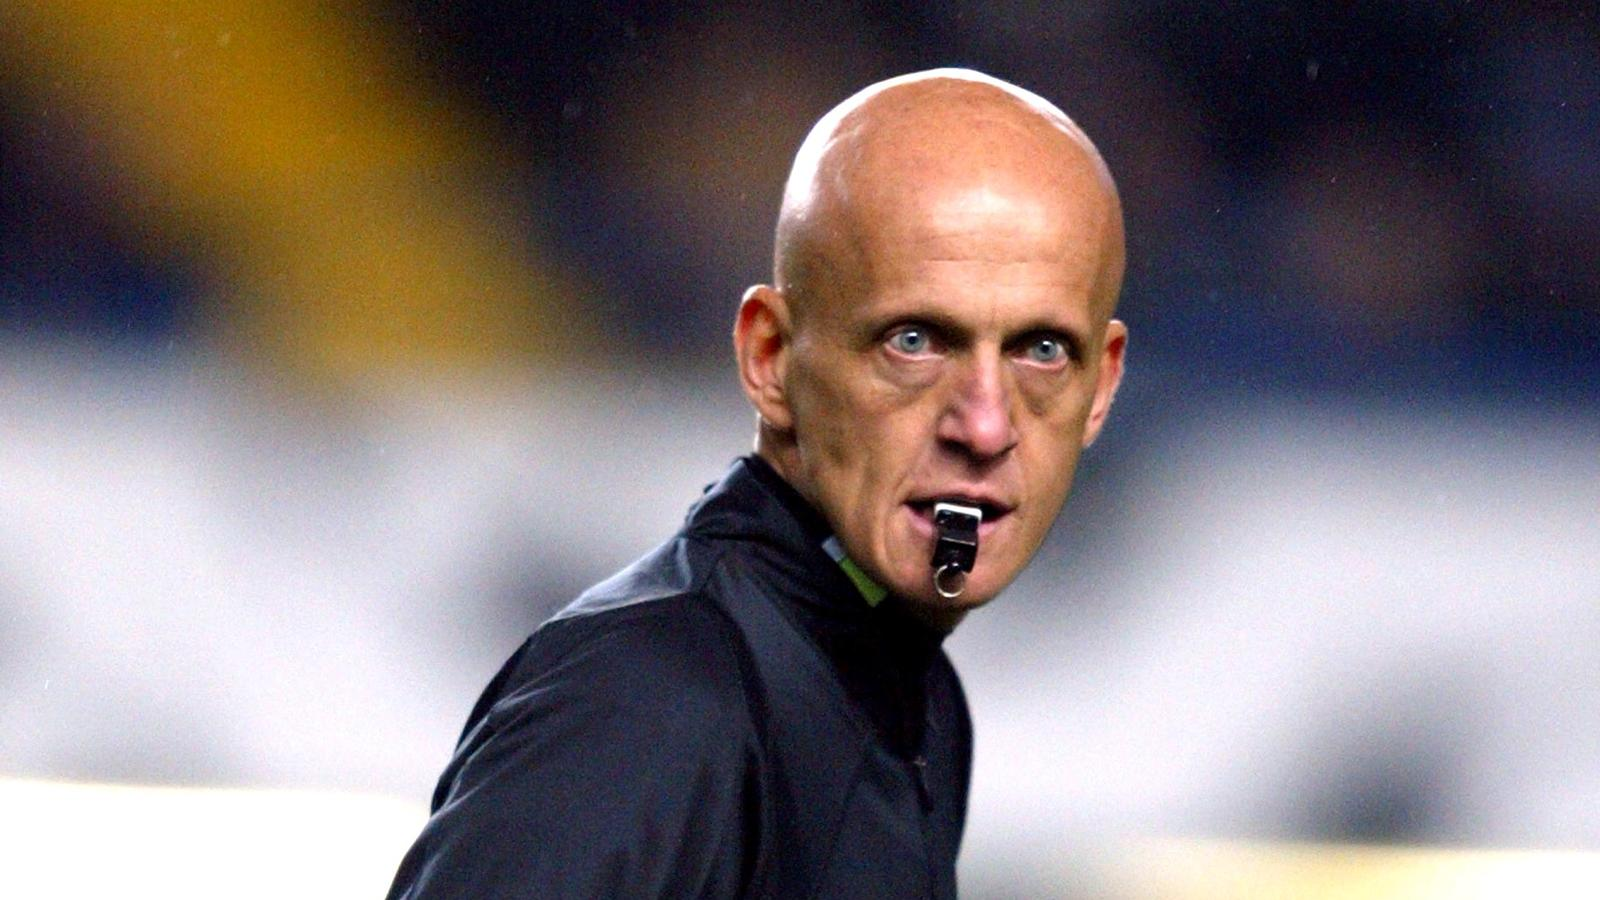 Schiedsrichter Colina